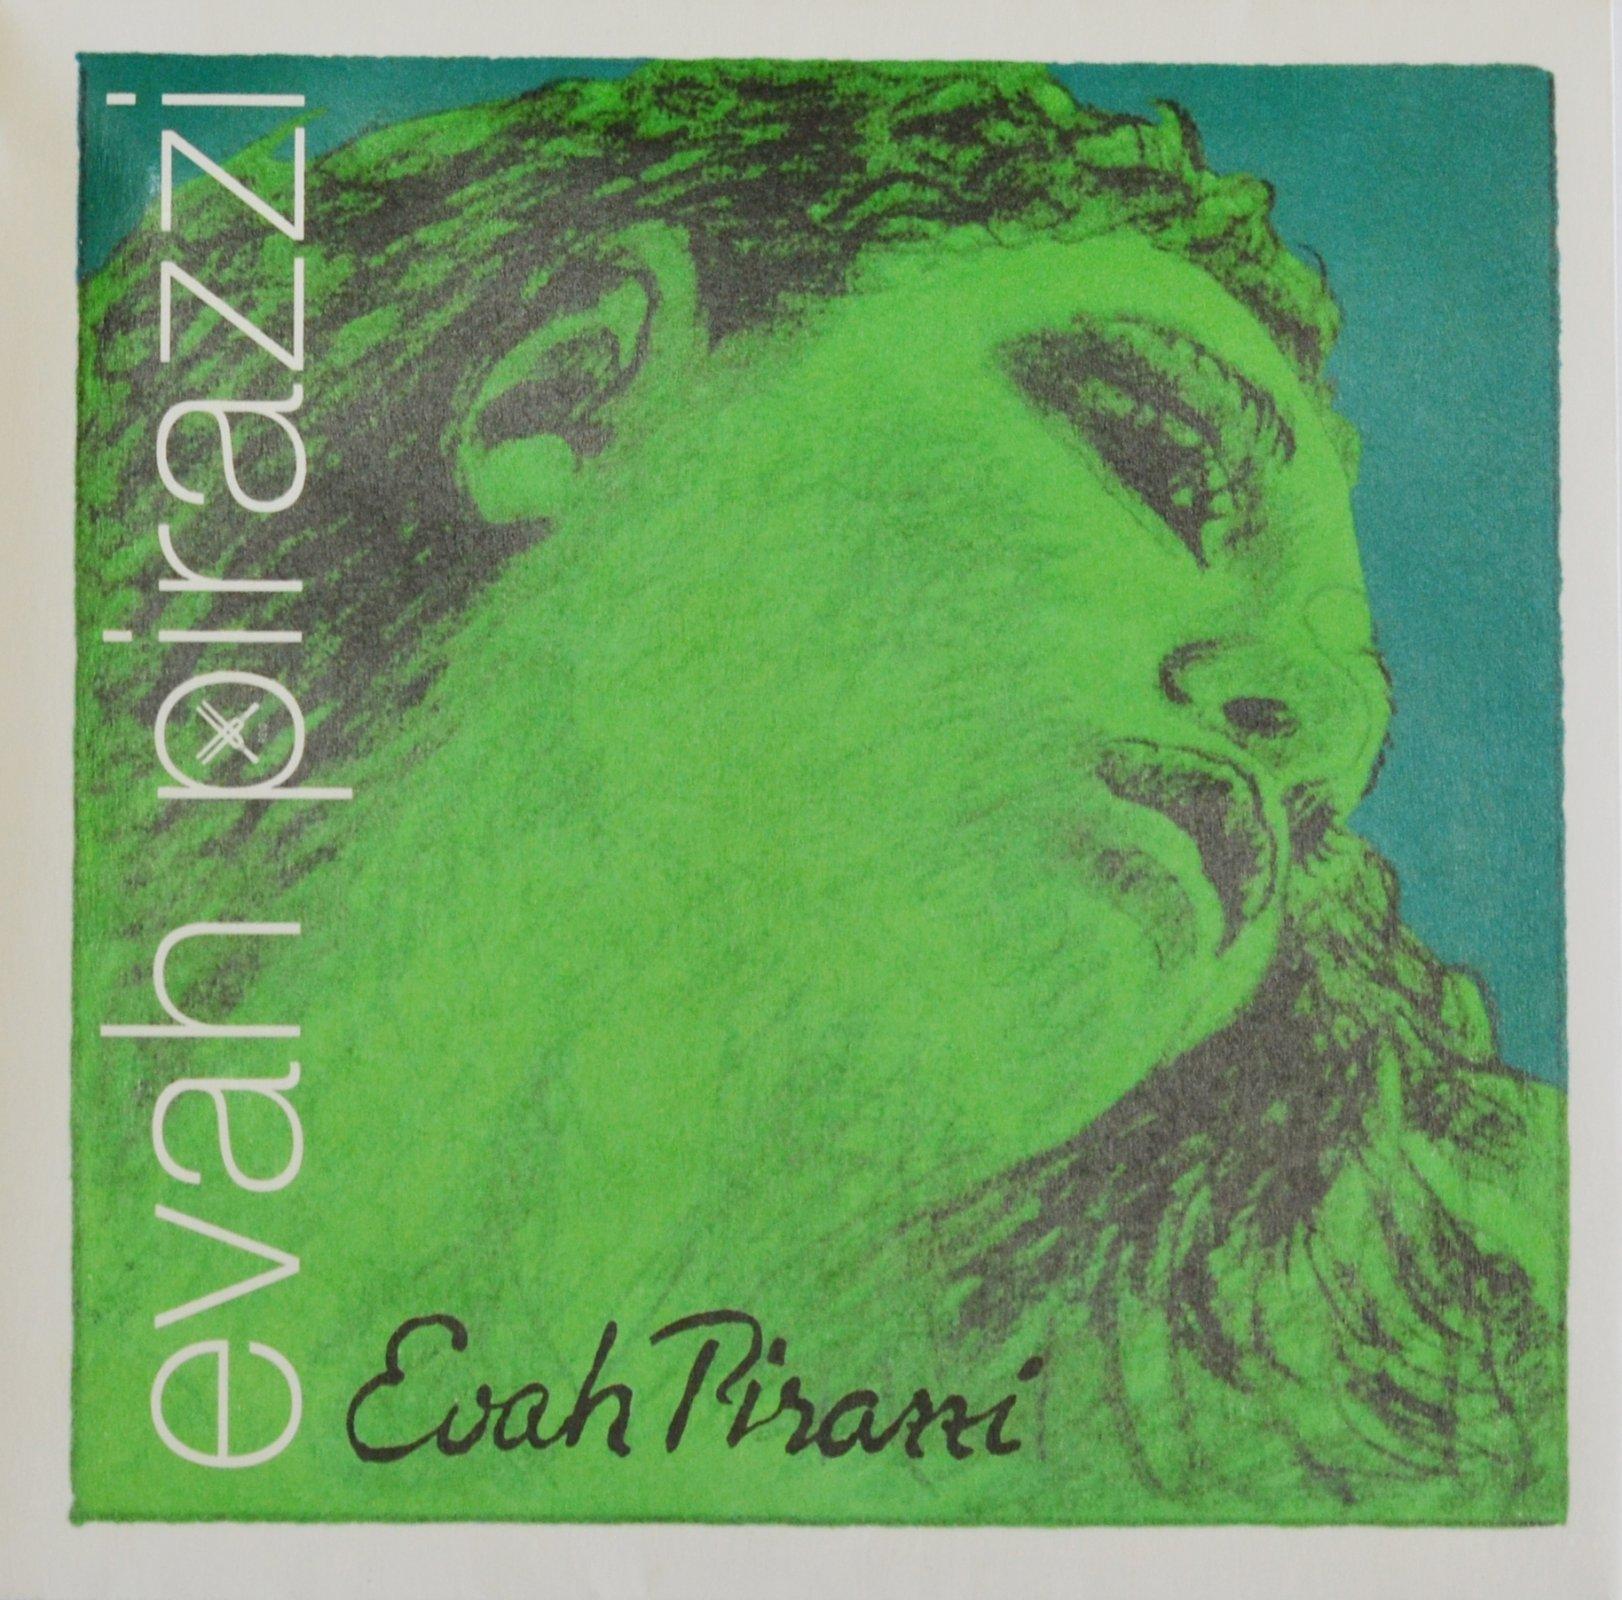 Evah Pirazzi Violin G 4/4 (Weich Light Tension)